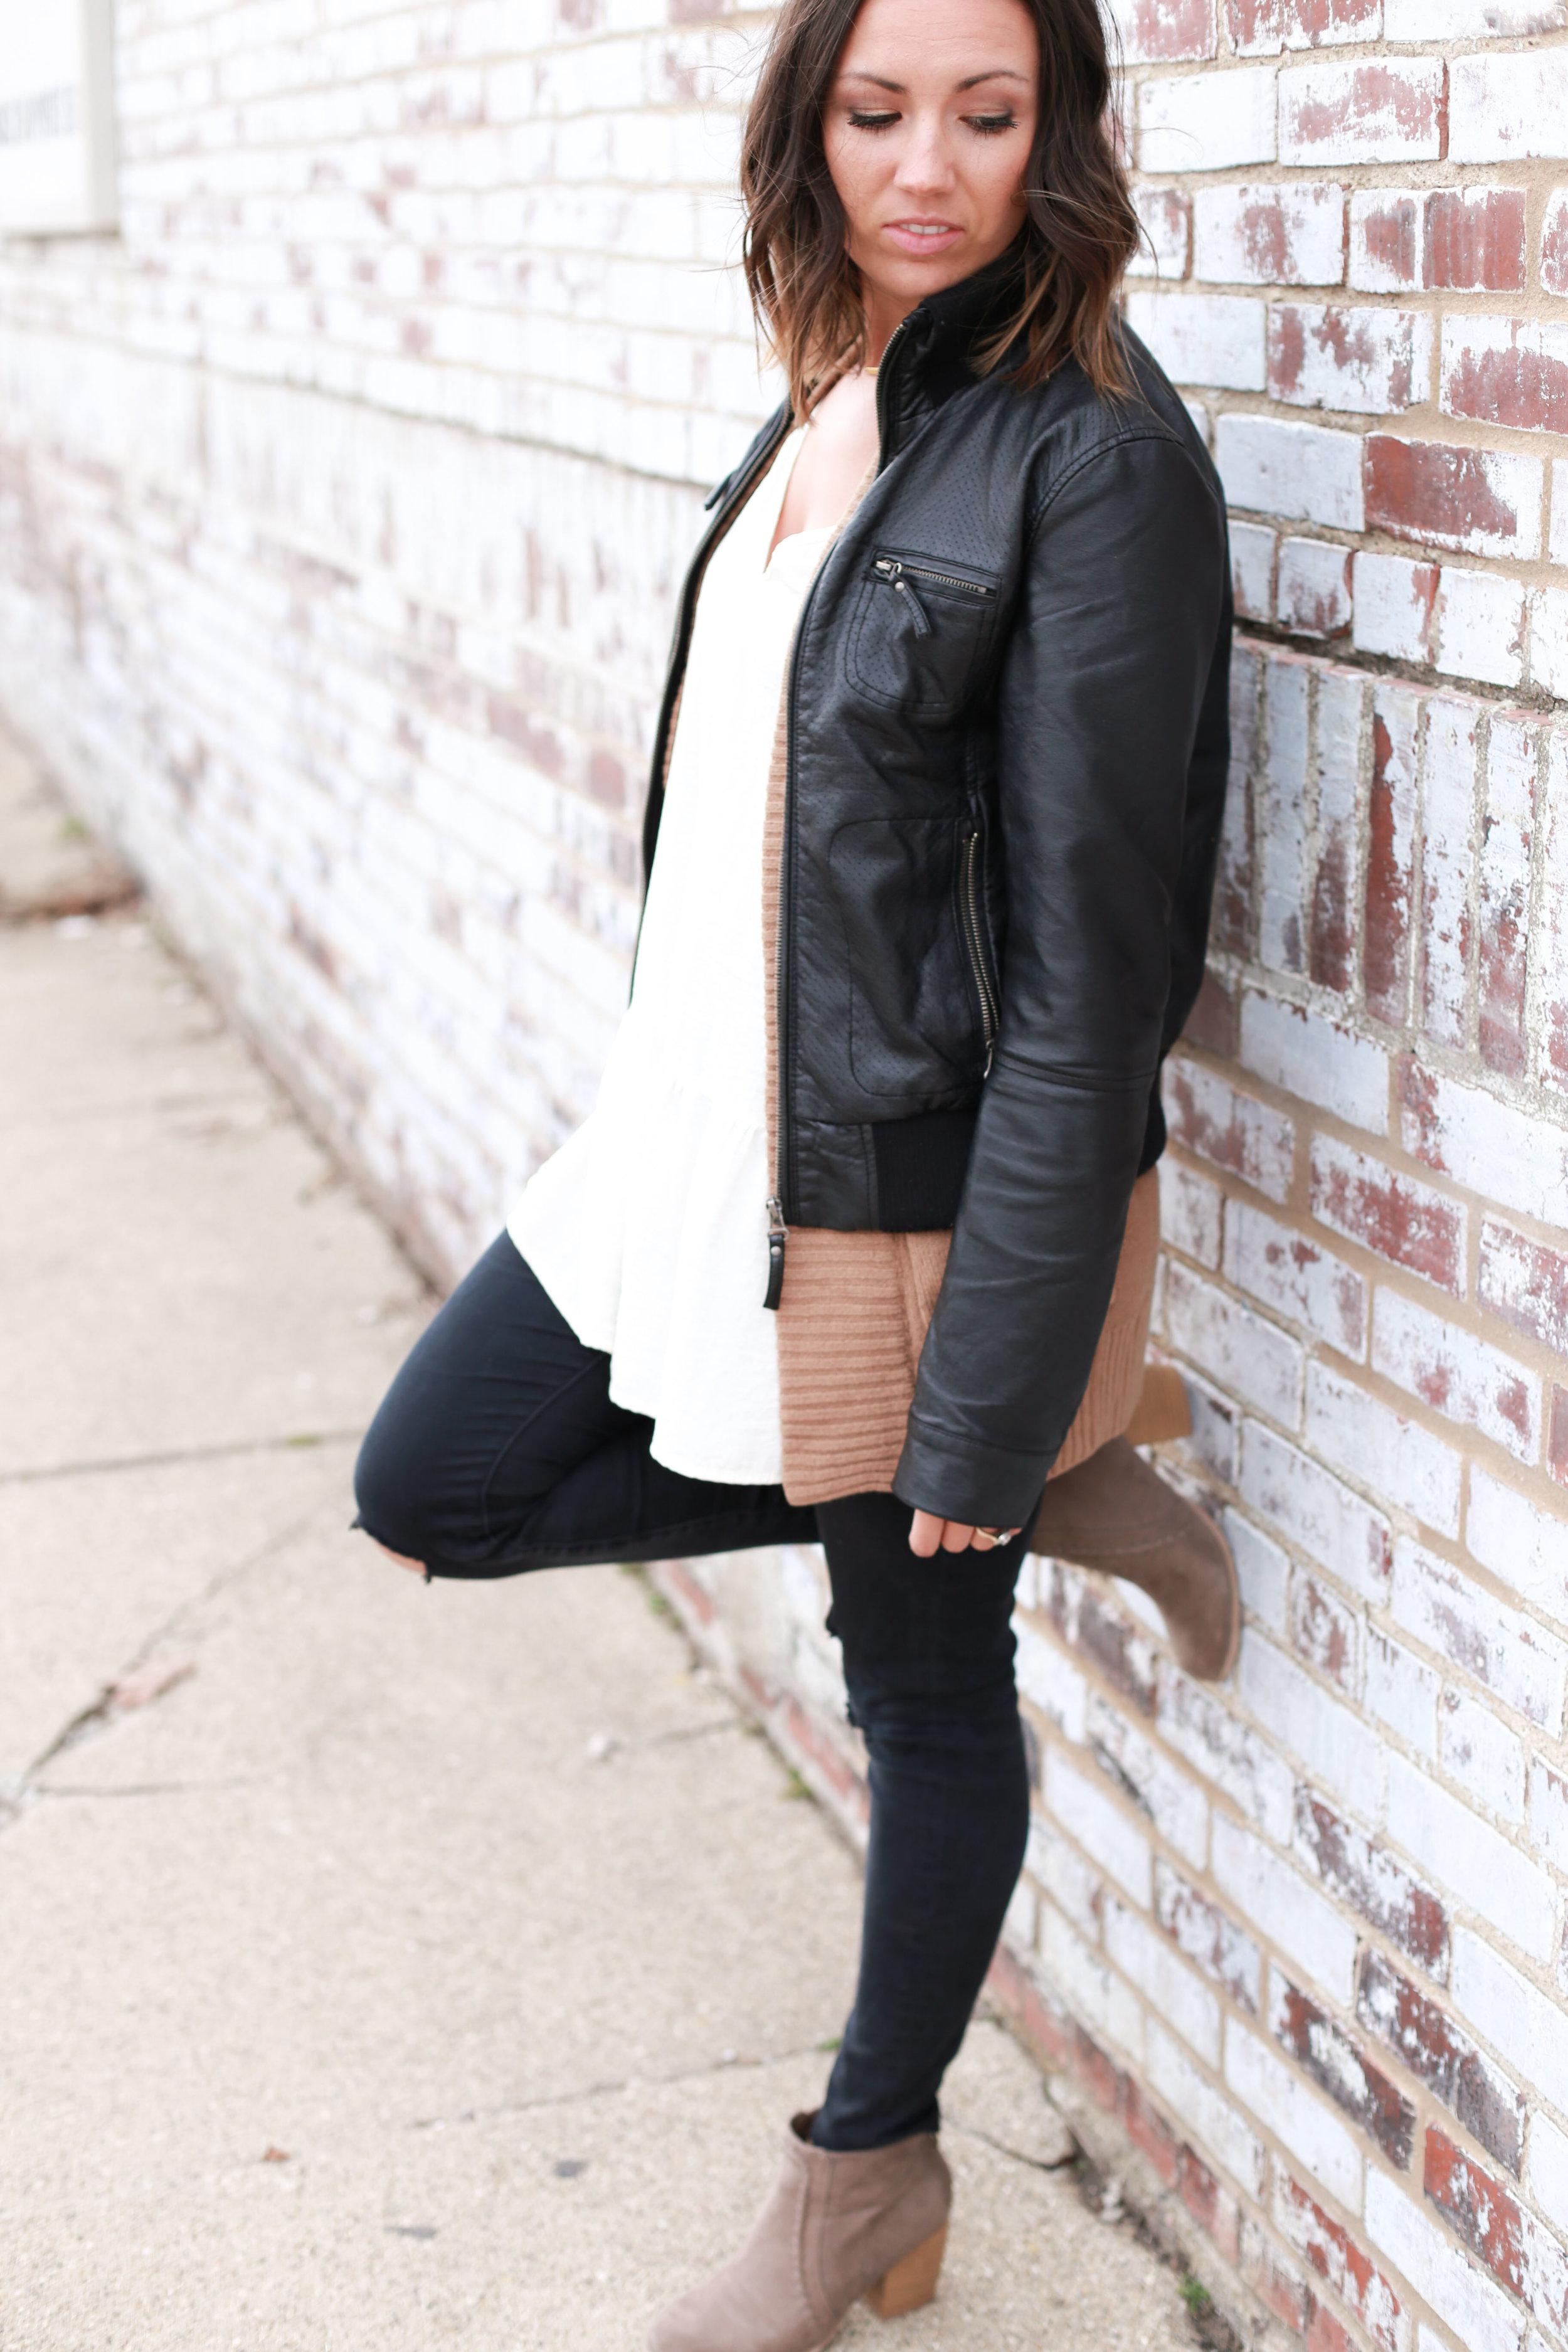 Fashion Friday: Simplify Your Look